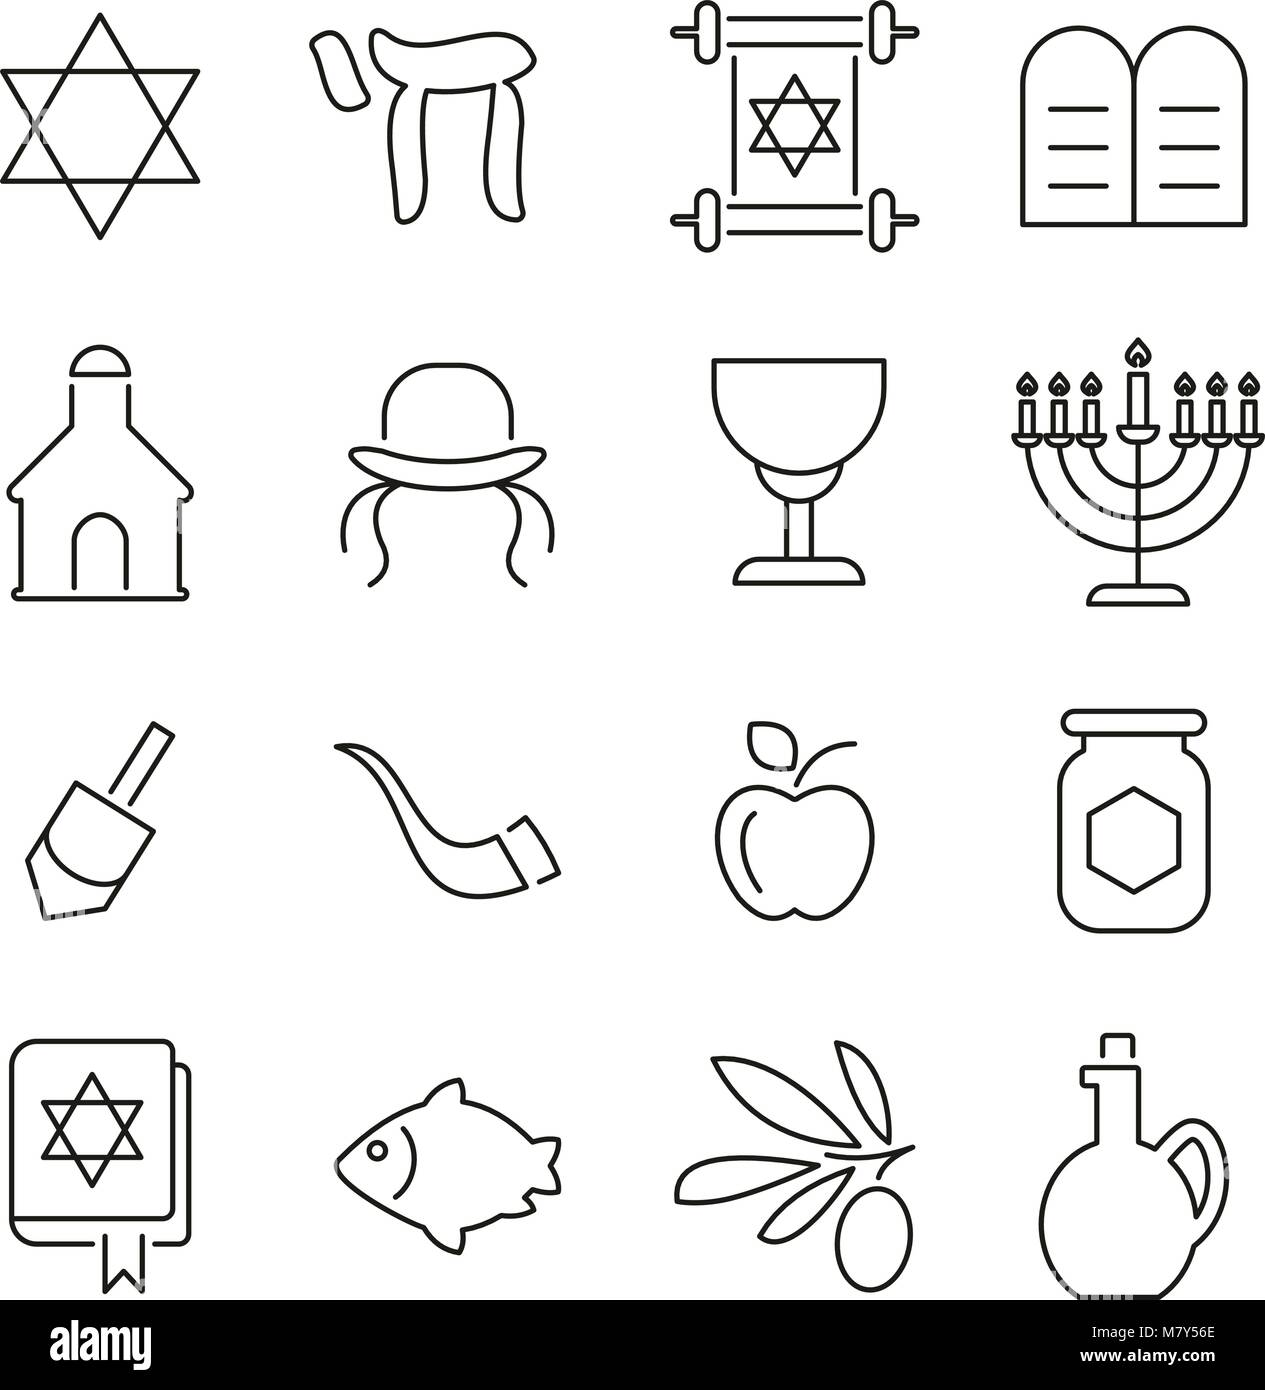 Judaism Religion & Religious Items Icons Thin Line Vector Illustration Set - Stock Image